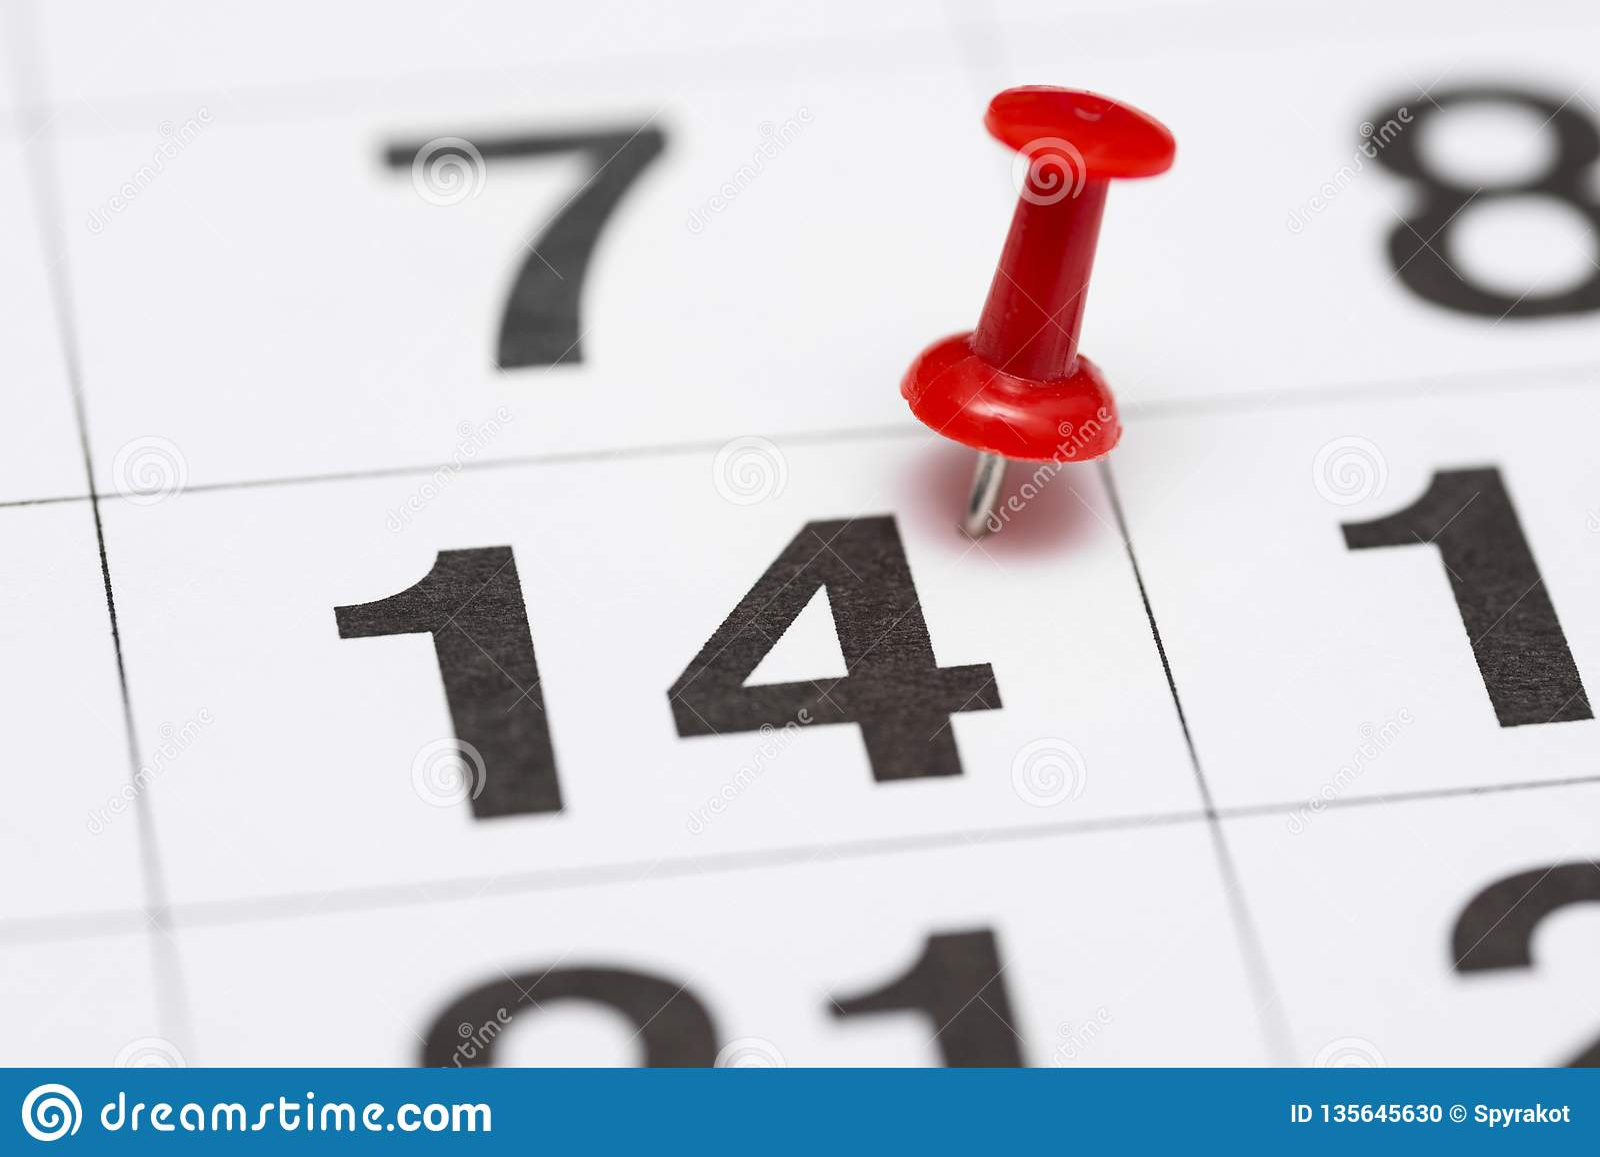 Pin在日期数14 第十四日标记用一个红色图钉 在日历的Pin